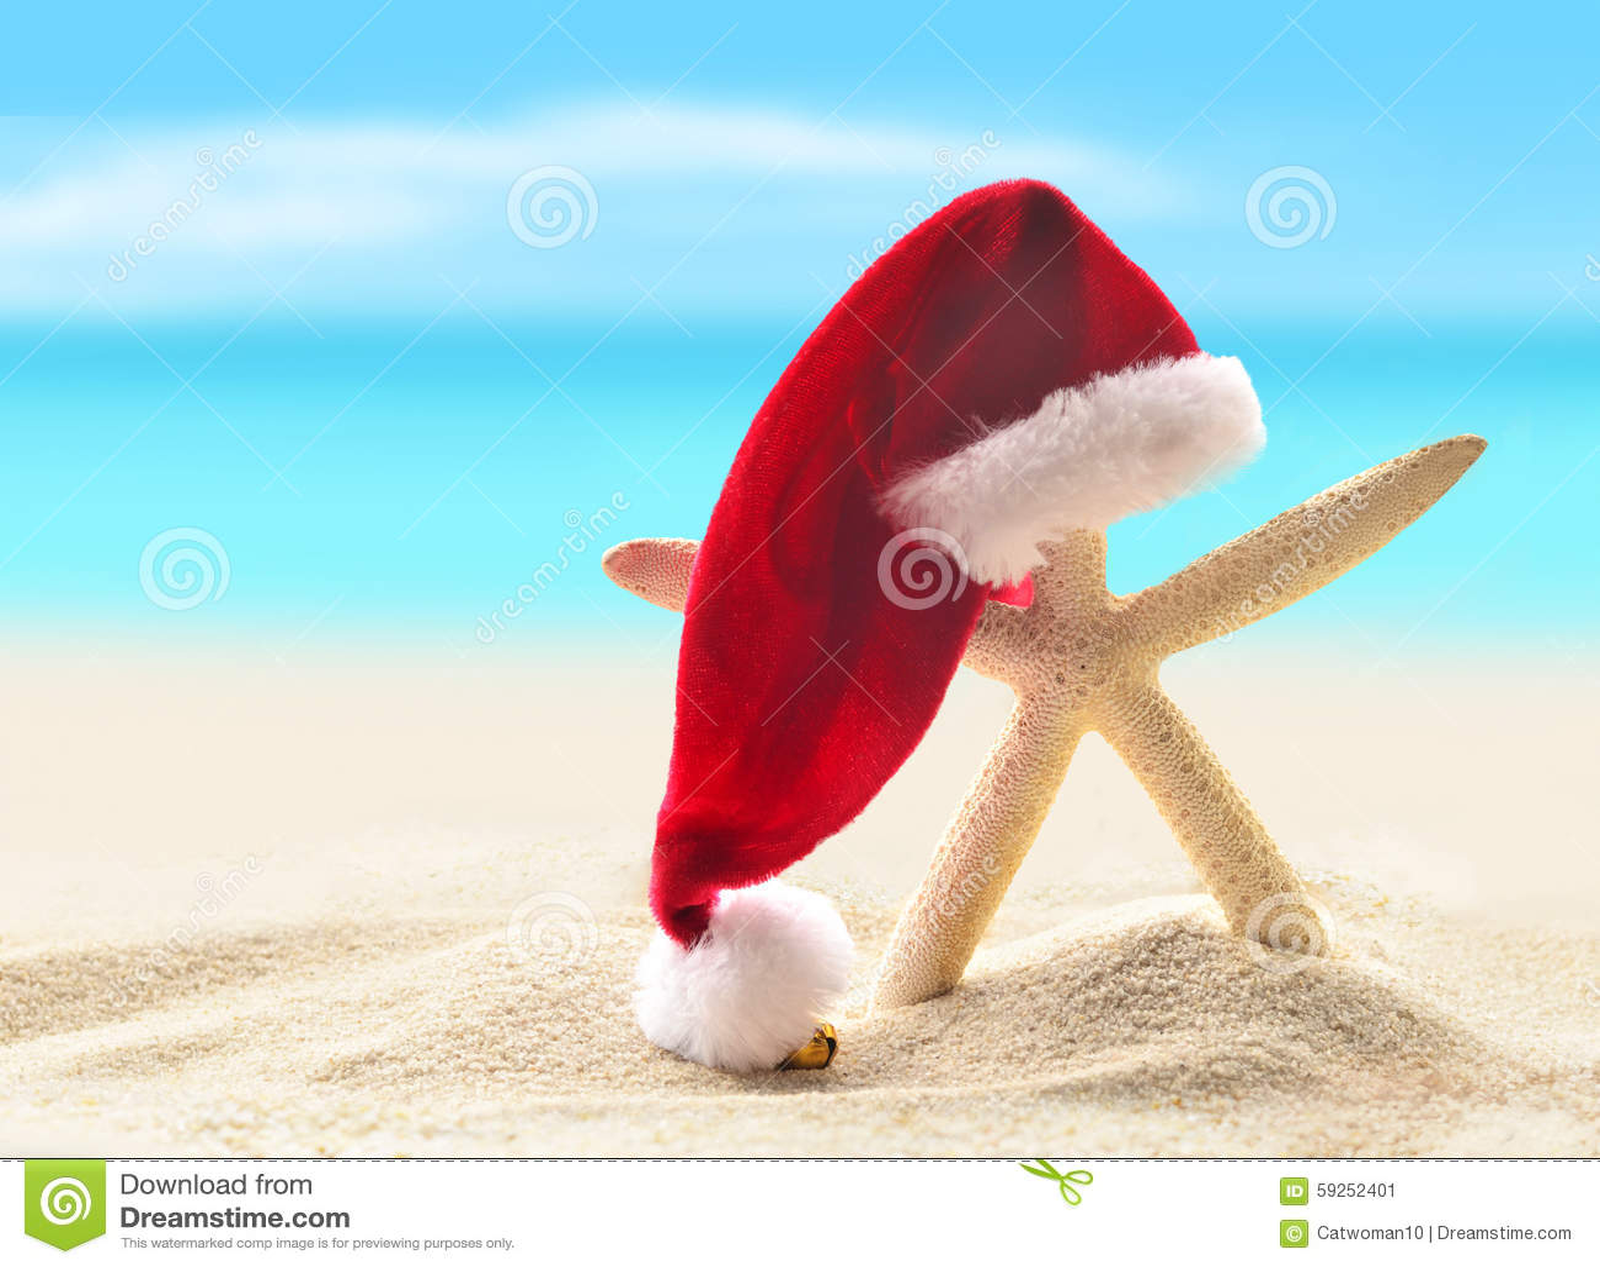 Sea-star In Santa Hat Walking At Sea Sandy Beach. Stock Image ...